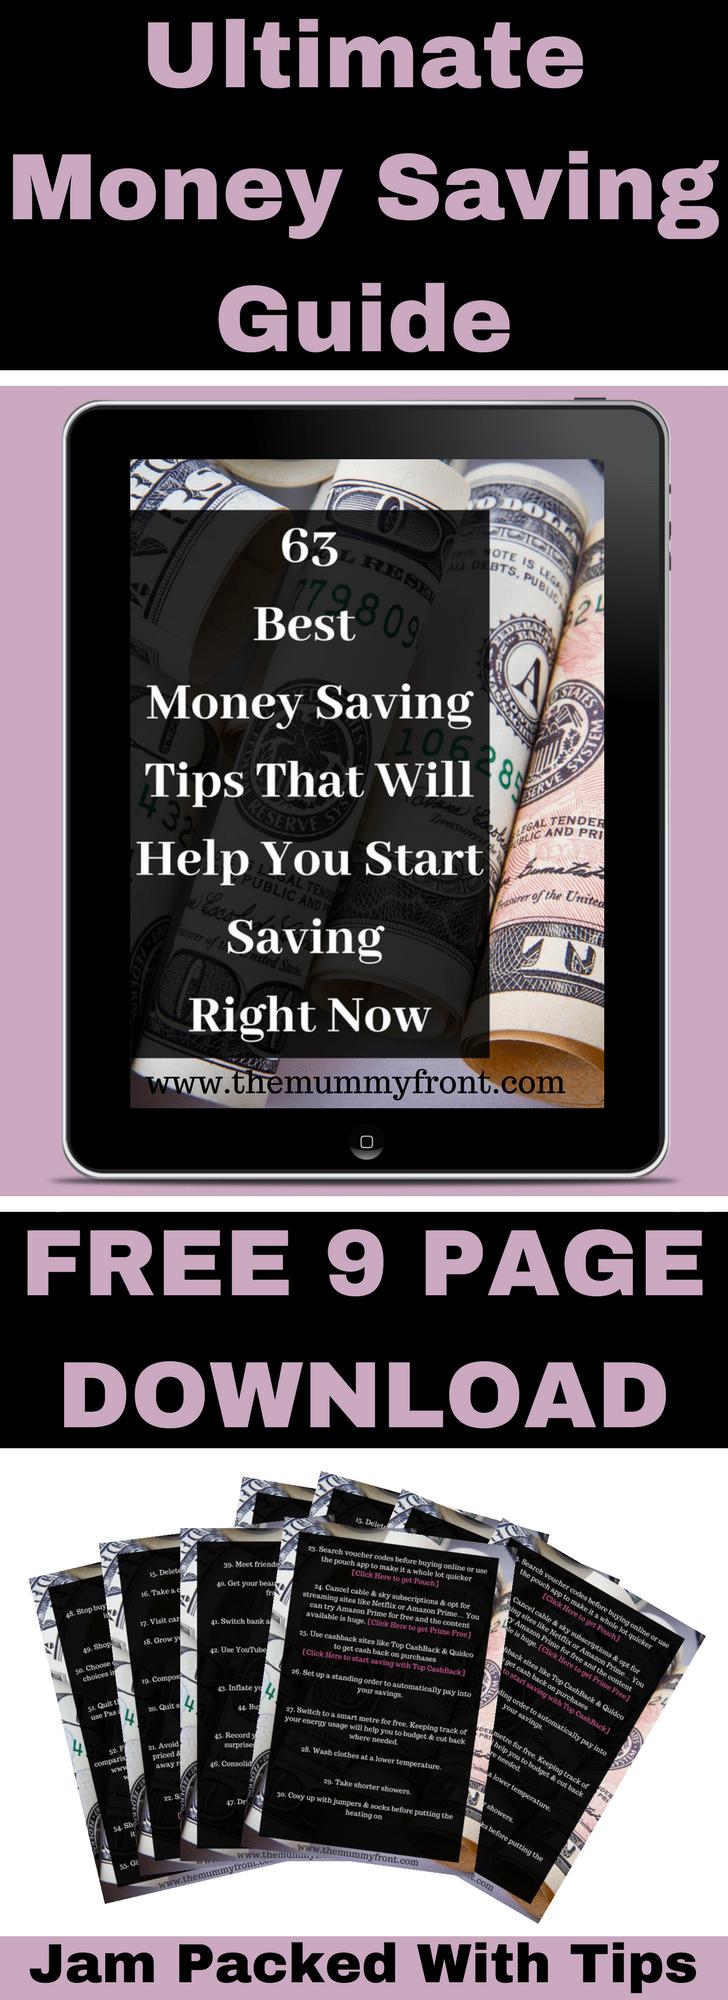 ultimate money saving tips #freedownload #moneysavingtips #money #debt #saving #debtfree #savingtips #frugalliving #frugal #freeprintable